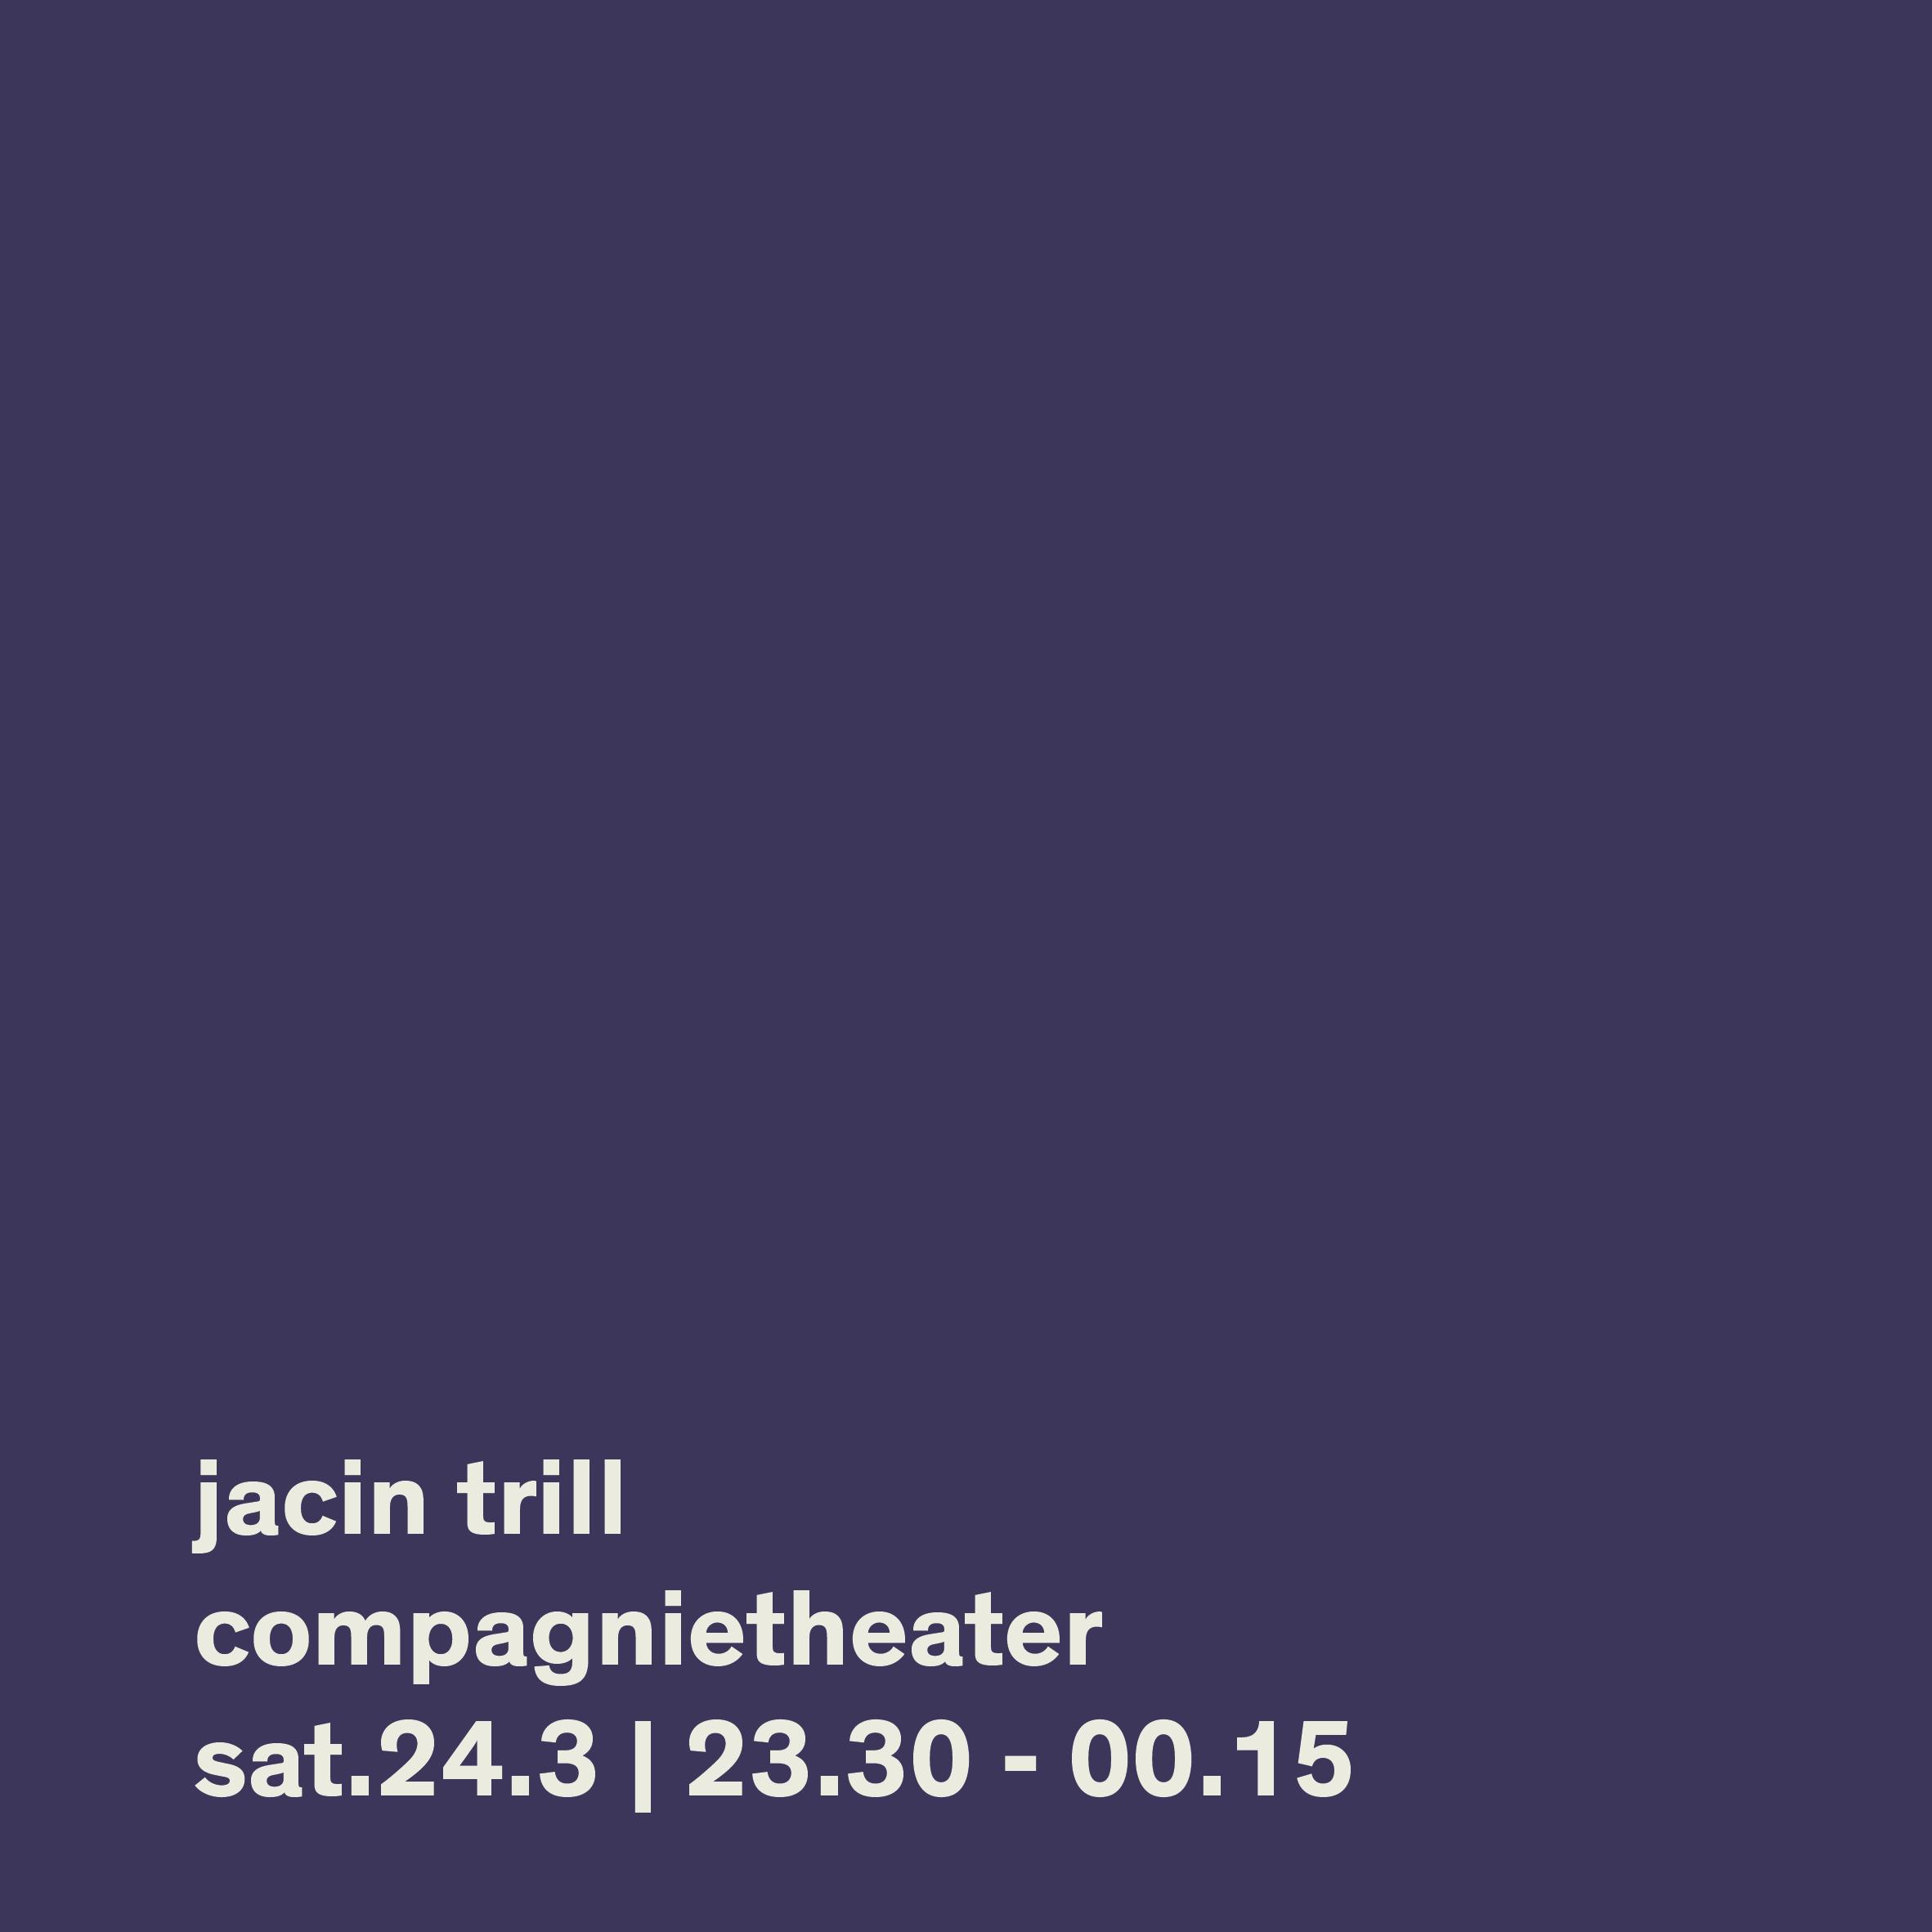 website-blocks_JACIN TRILL.png